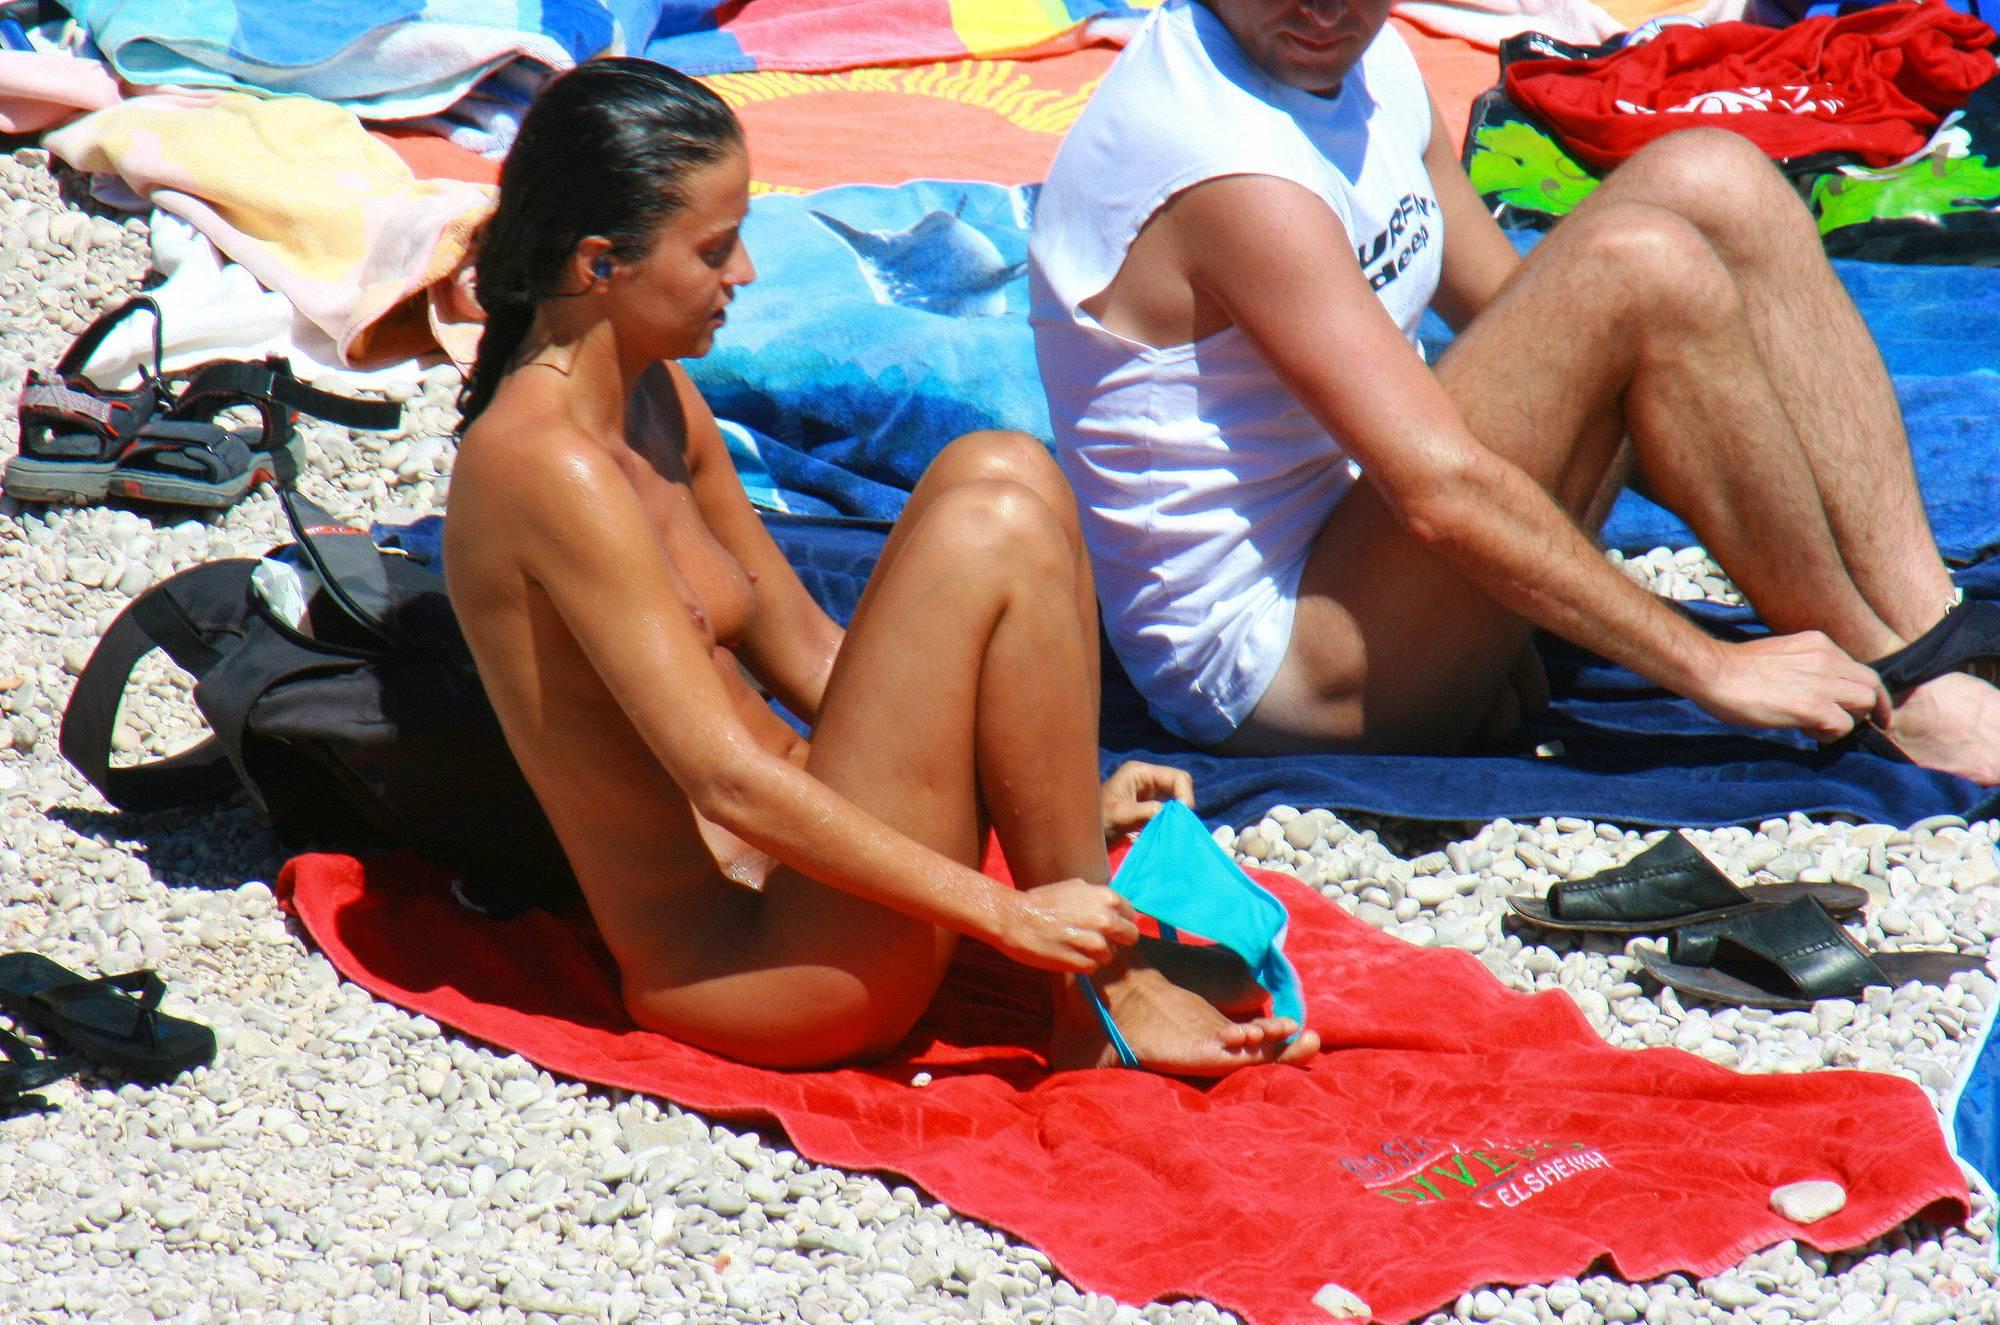 Purenudism Pics Ula FKK Red Beach Woman - 2